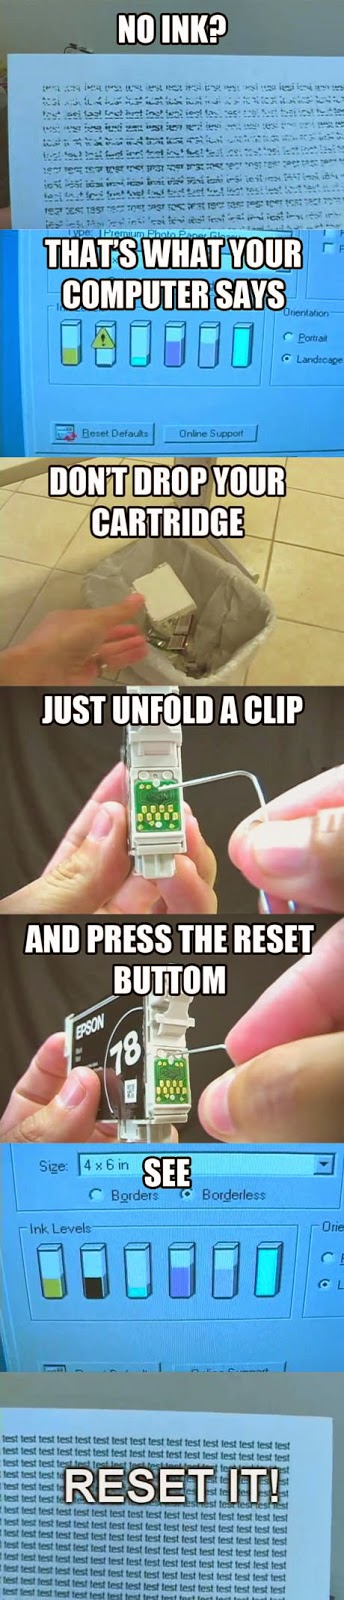 Reset your inkjet cartridge